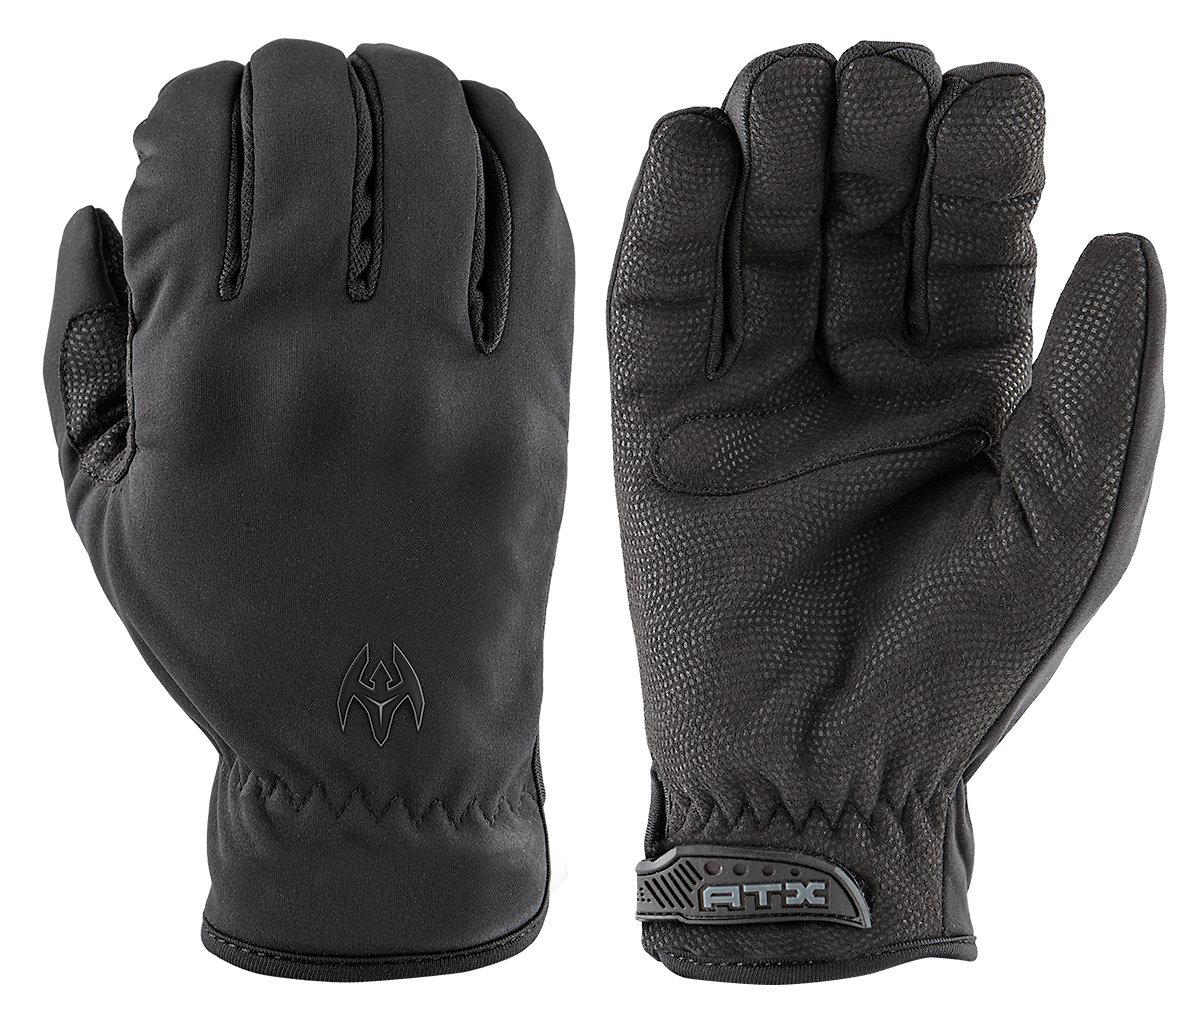 Winter Cut Resistant Patrol Gloves w/ Kevlar® Palm ATX150